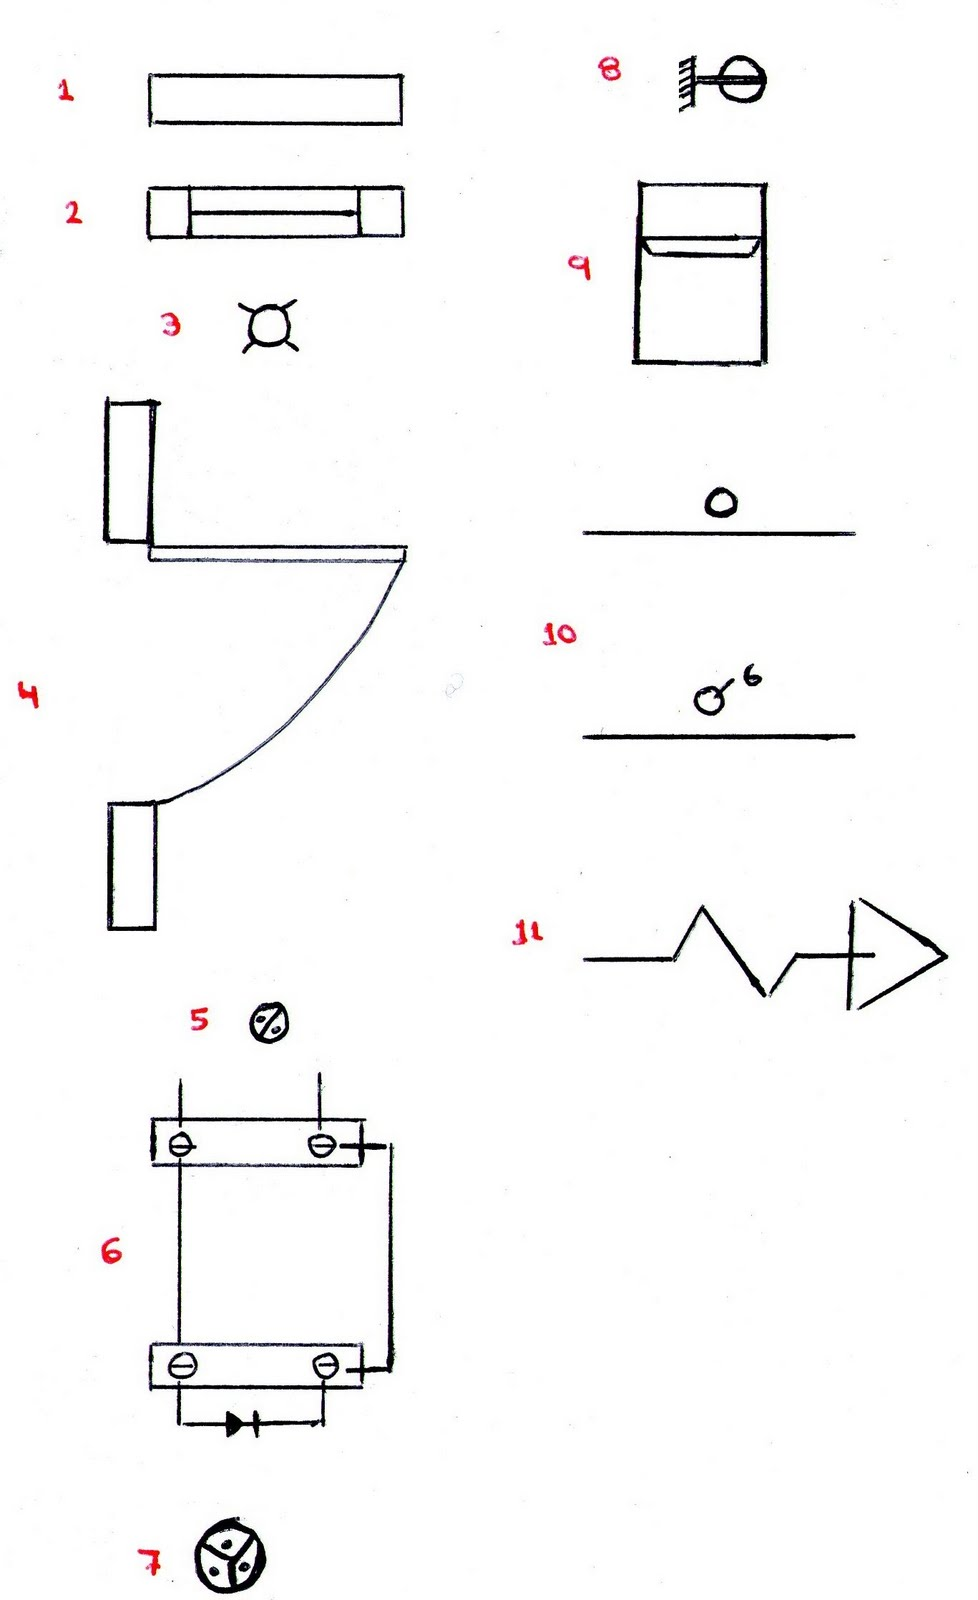 Vanee simbologia en un plano for Simbologia de niveles en planos arquitectonicos